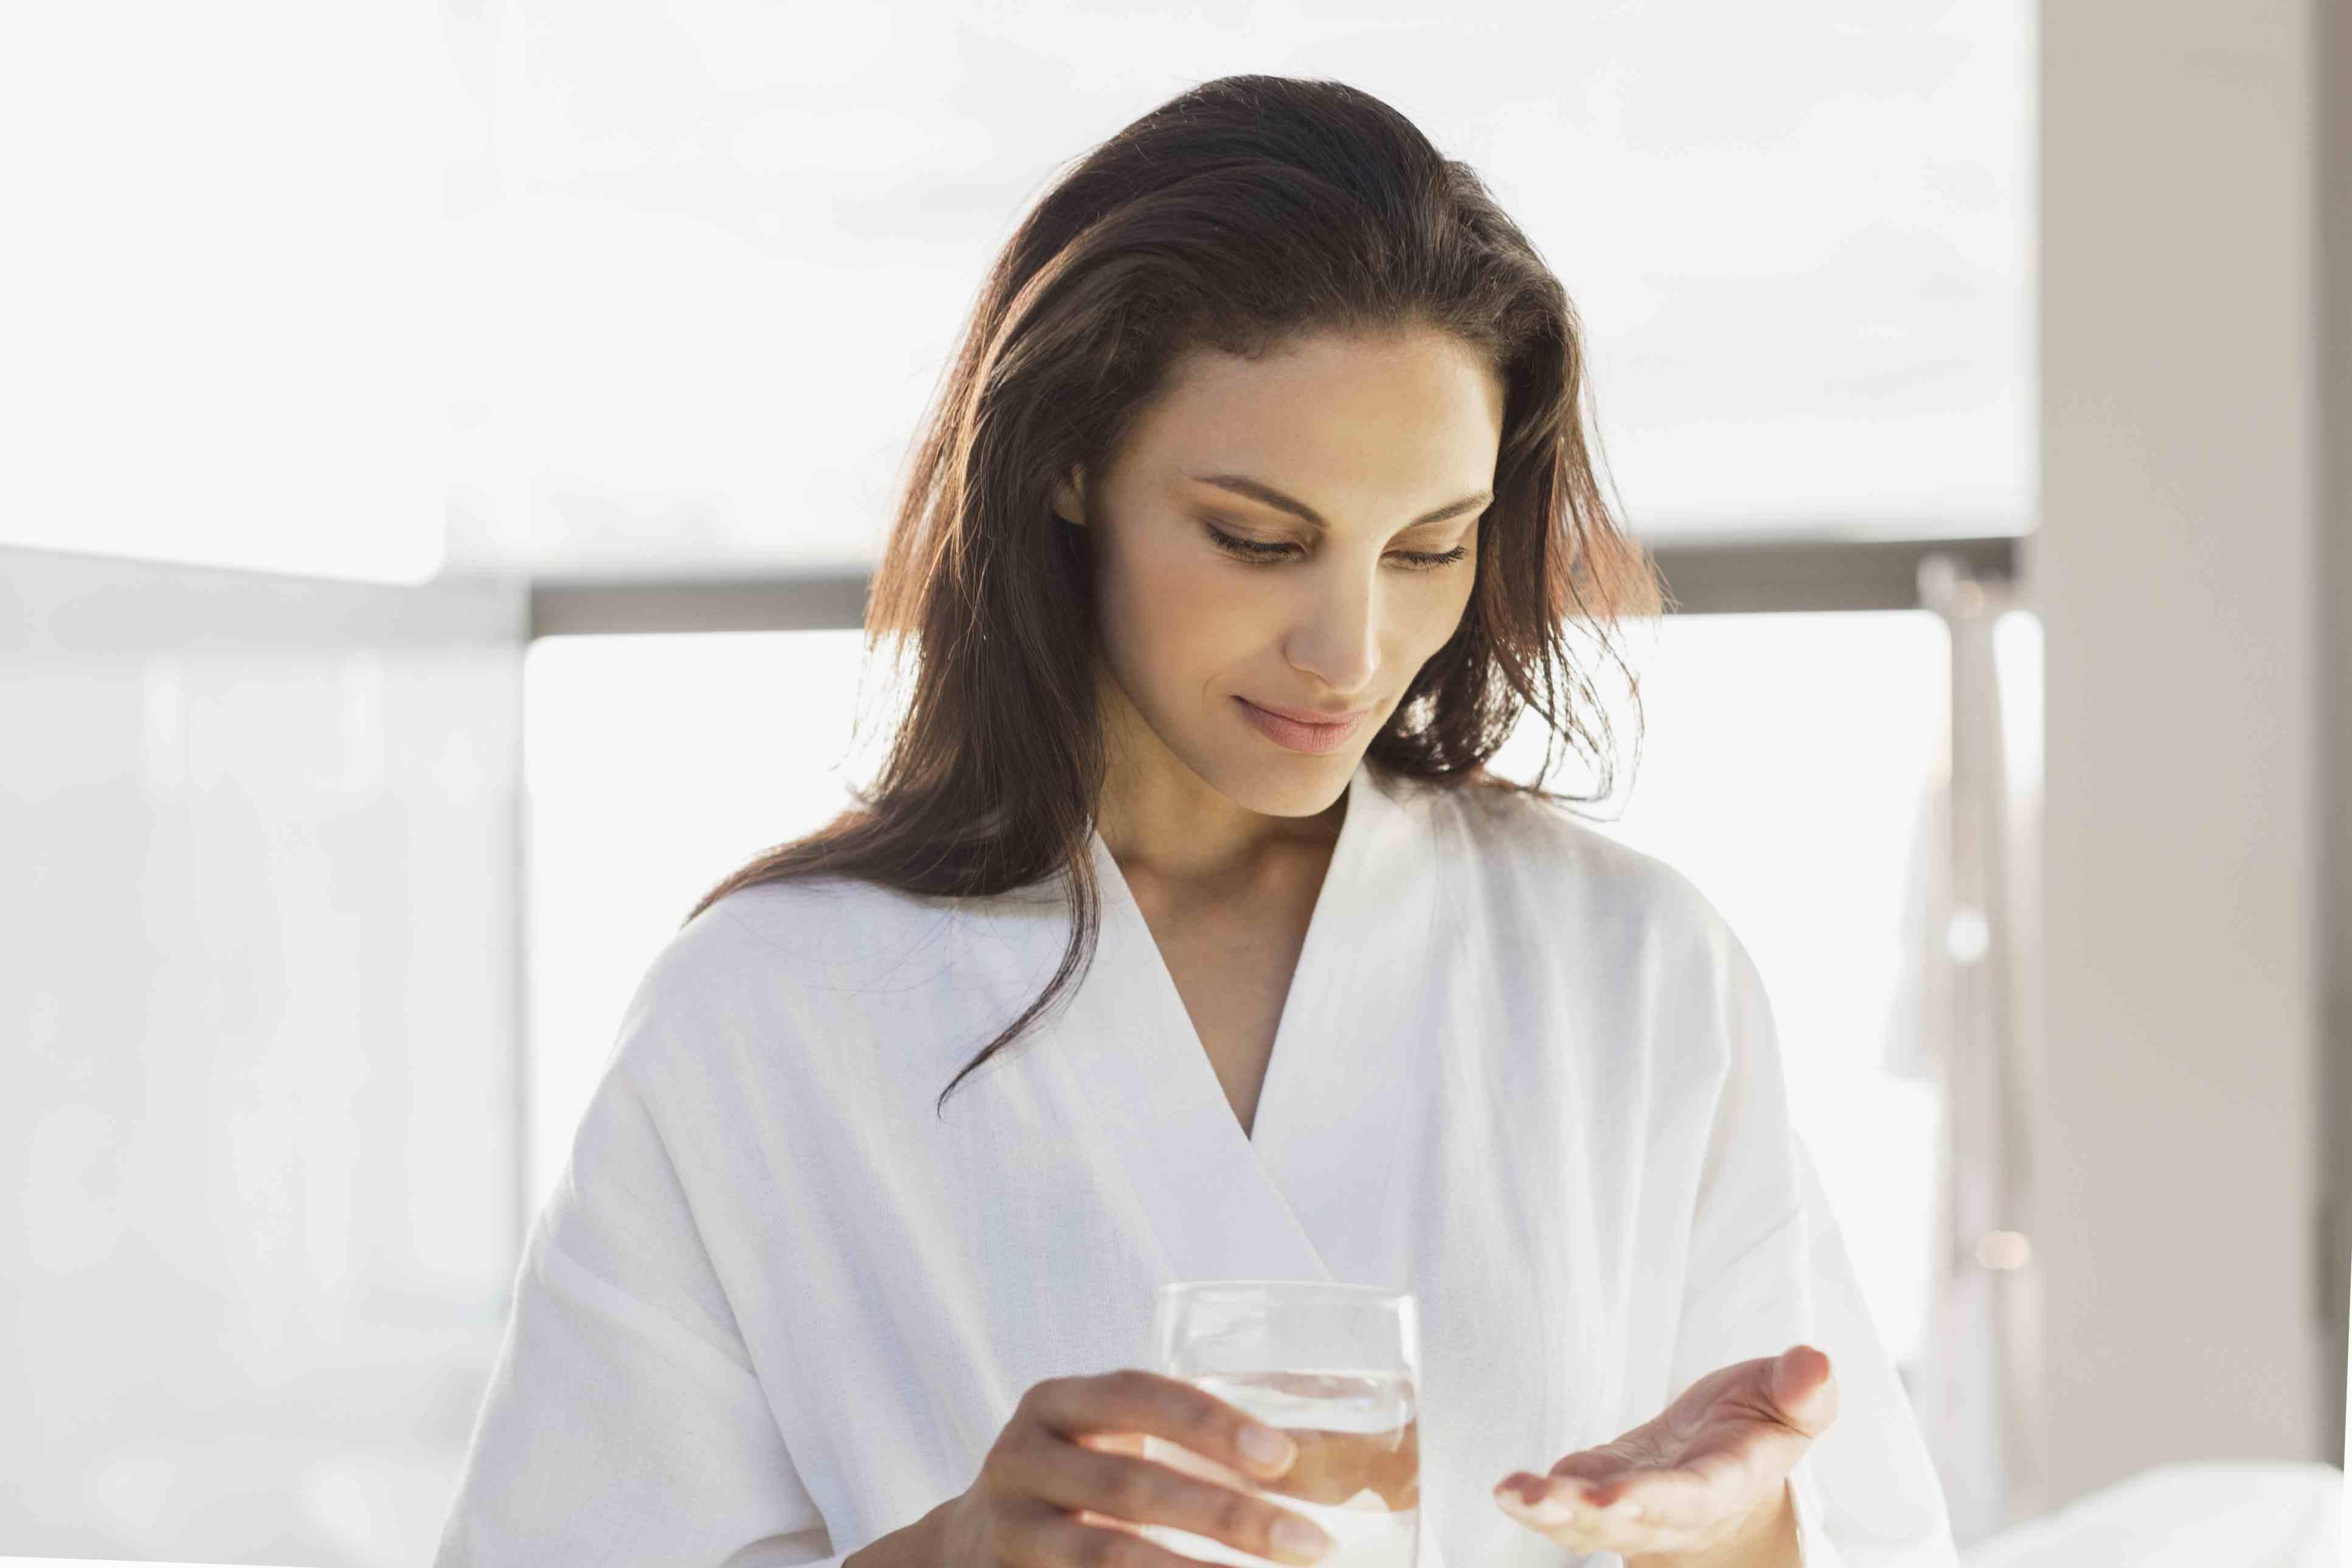 Woman taking a pill